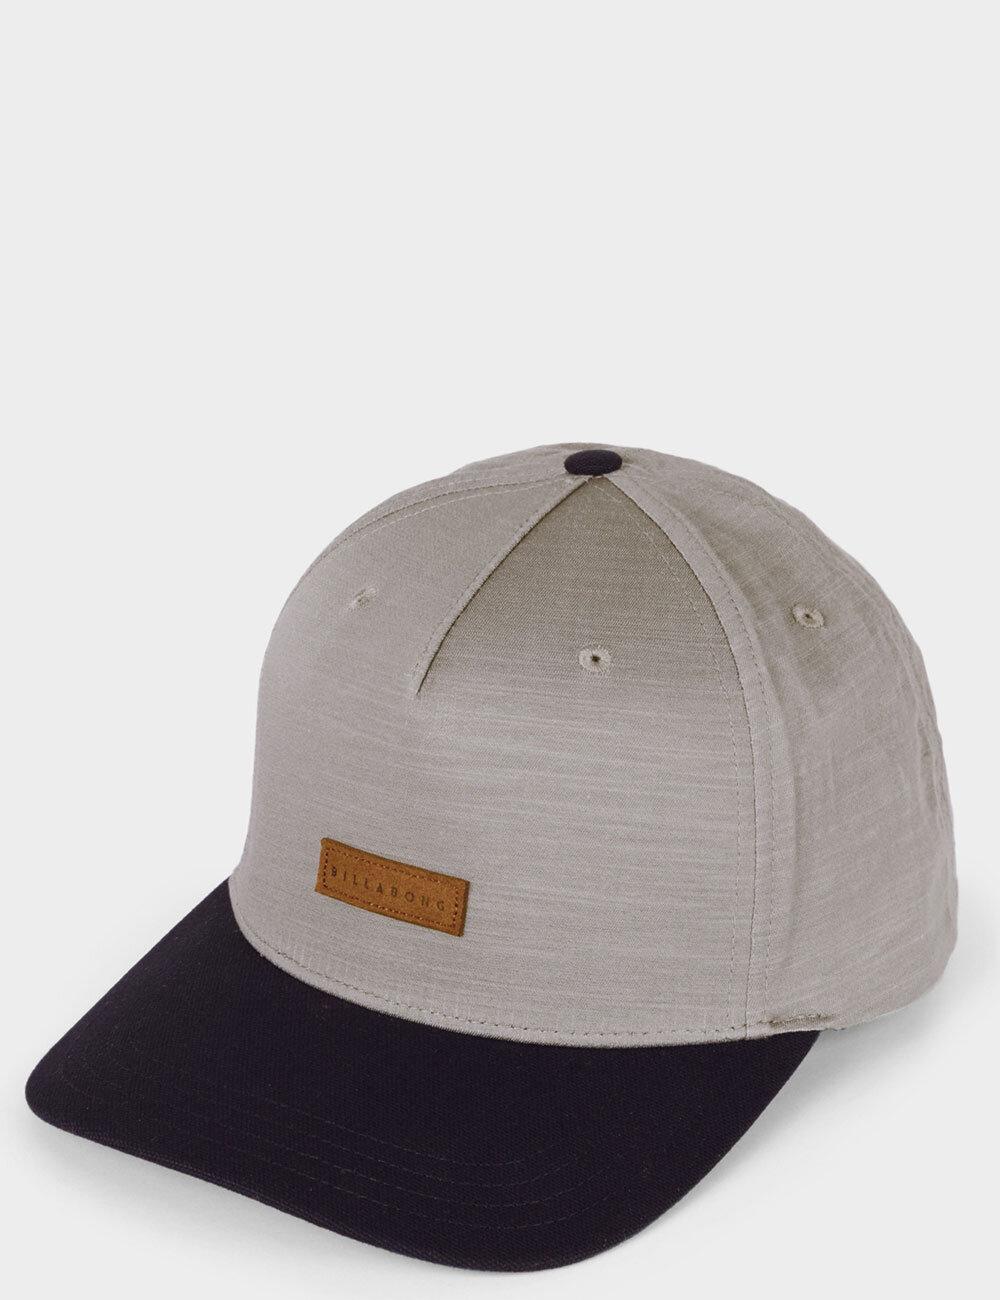 cheaper edec4 60d40 OXFORD SNAPBACK - Men s Accessories   Surf   Skate Brands   Streetwear -  BILLABONG S18